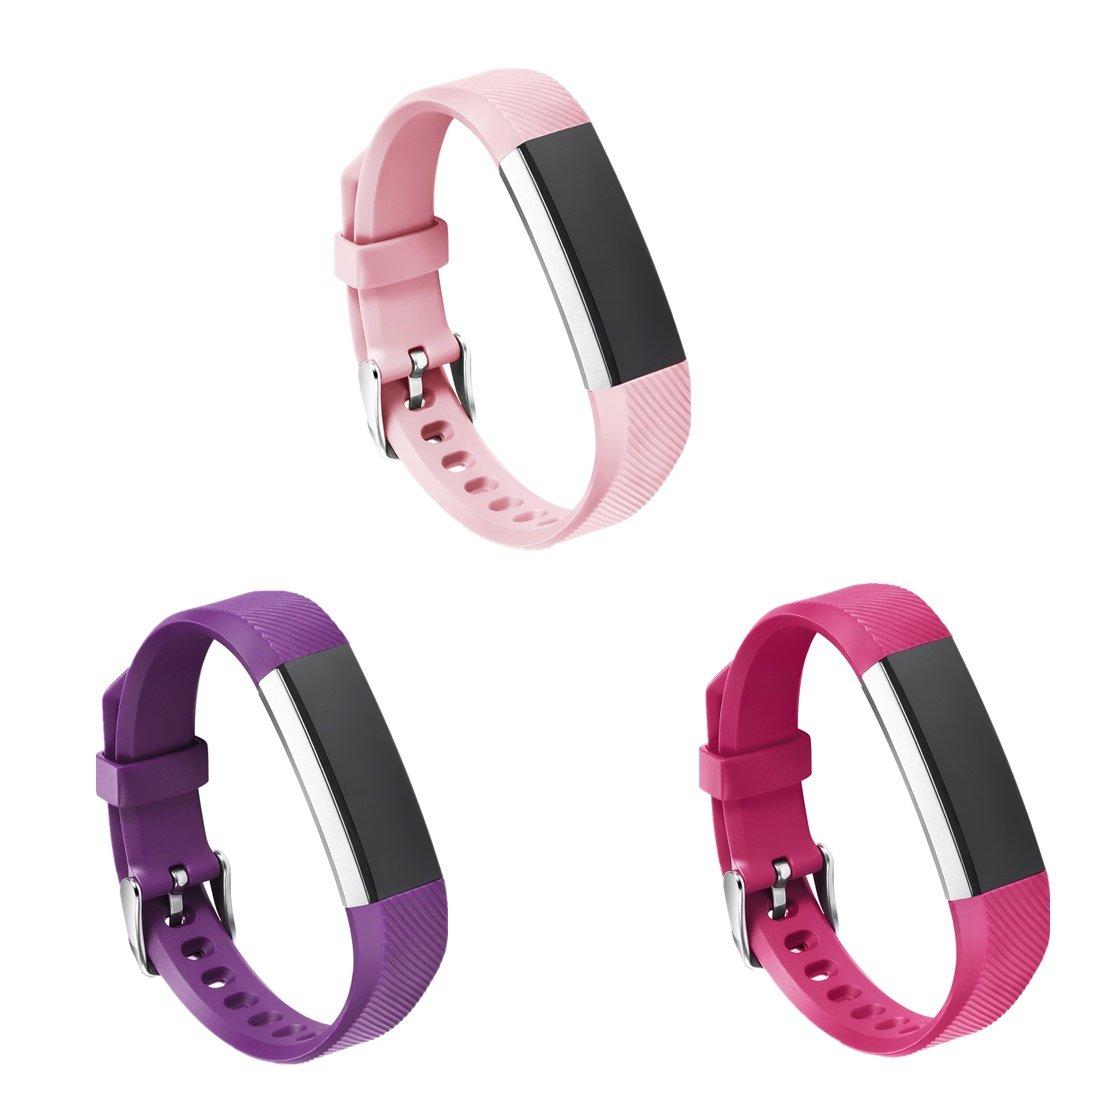 gincoband 3pcs Fitbit ALTA HRバンド、Fitbit ALTA交換用バンドfor Fitbit ALTA HR with Watchバックル B06XFRFCMJ Purple+Red+Nude Pink 3PCS Buckle Design